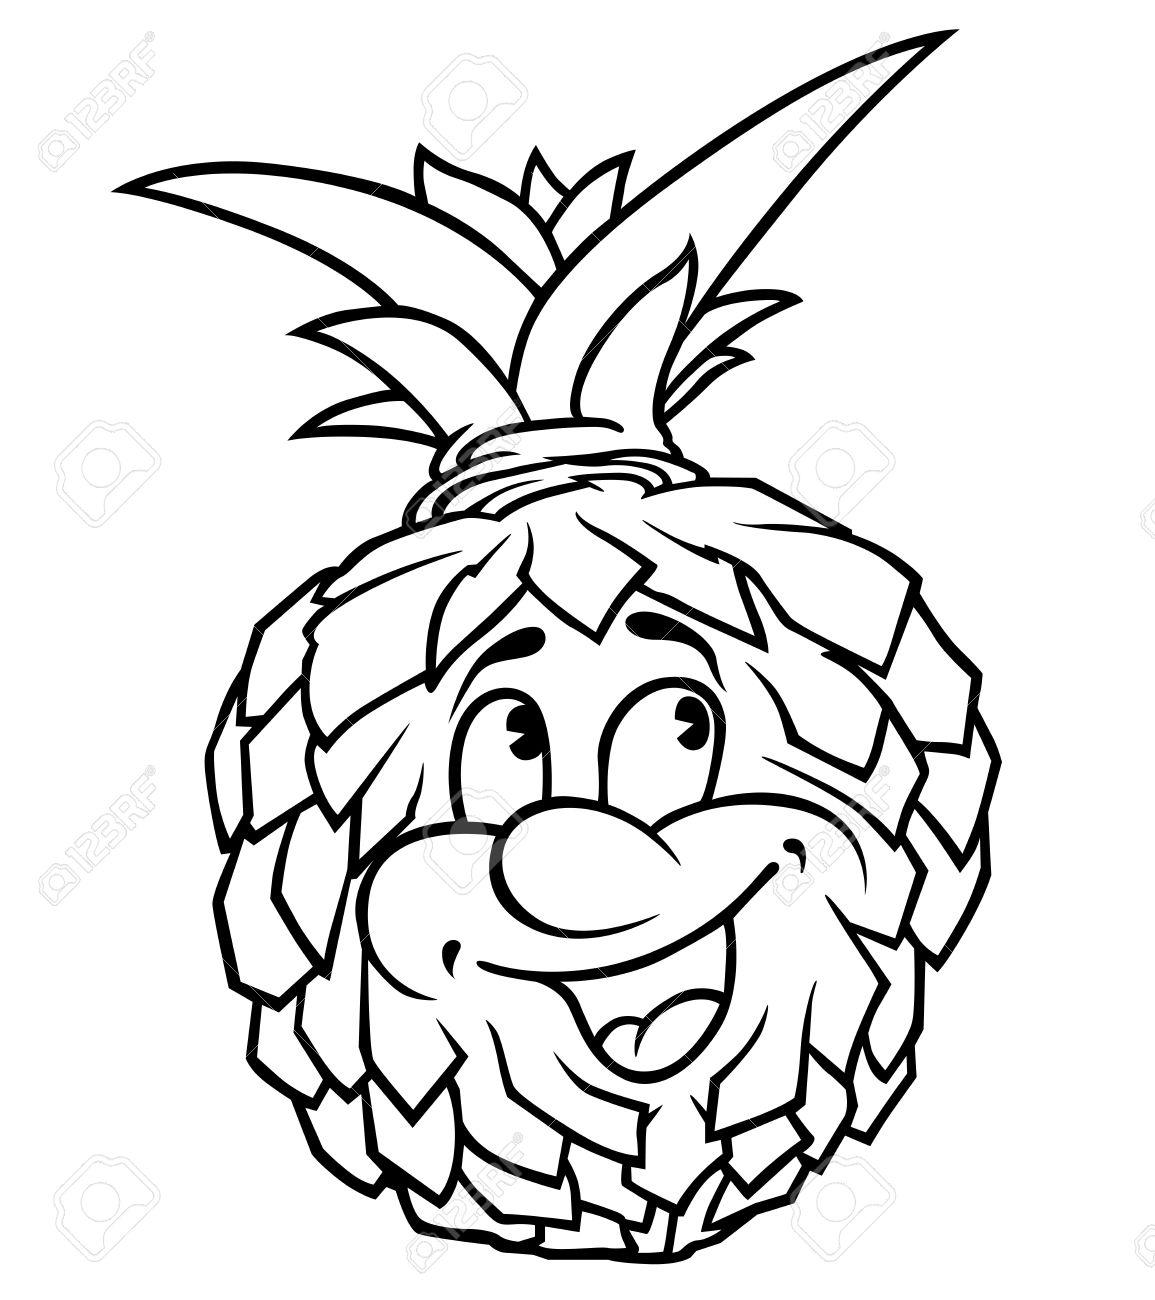 Pineapple - Black And White Cartoon Illustration, Royalty Free ... for Clipart Pineapple Black And White  75sfw